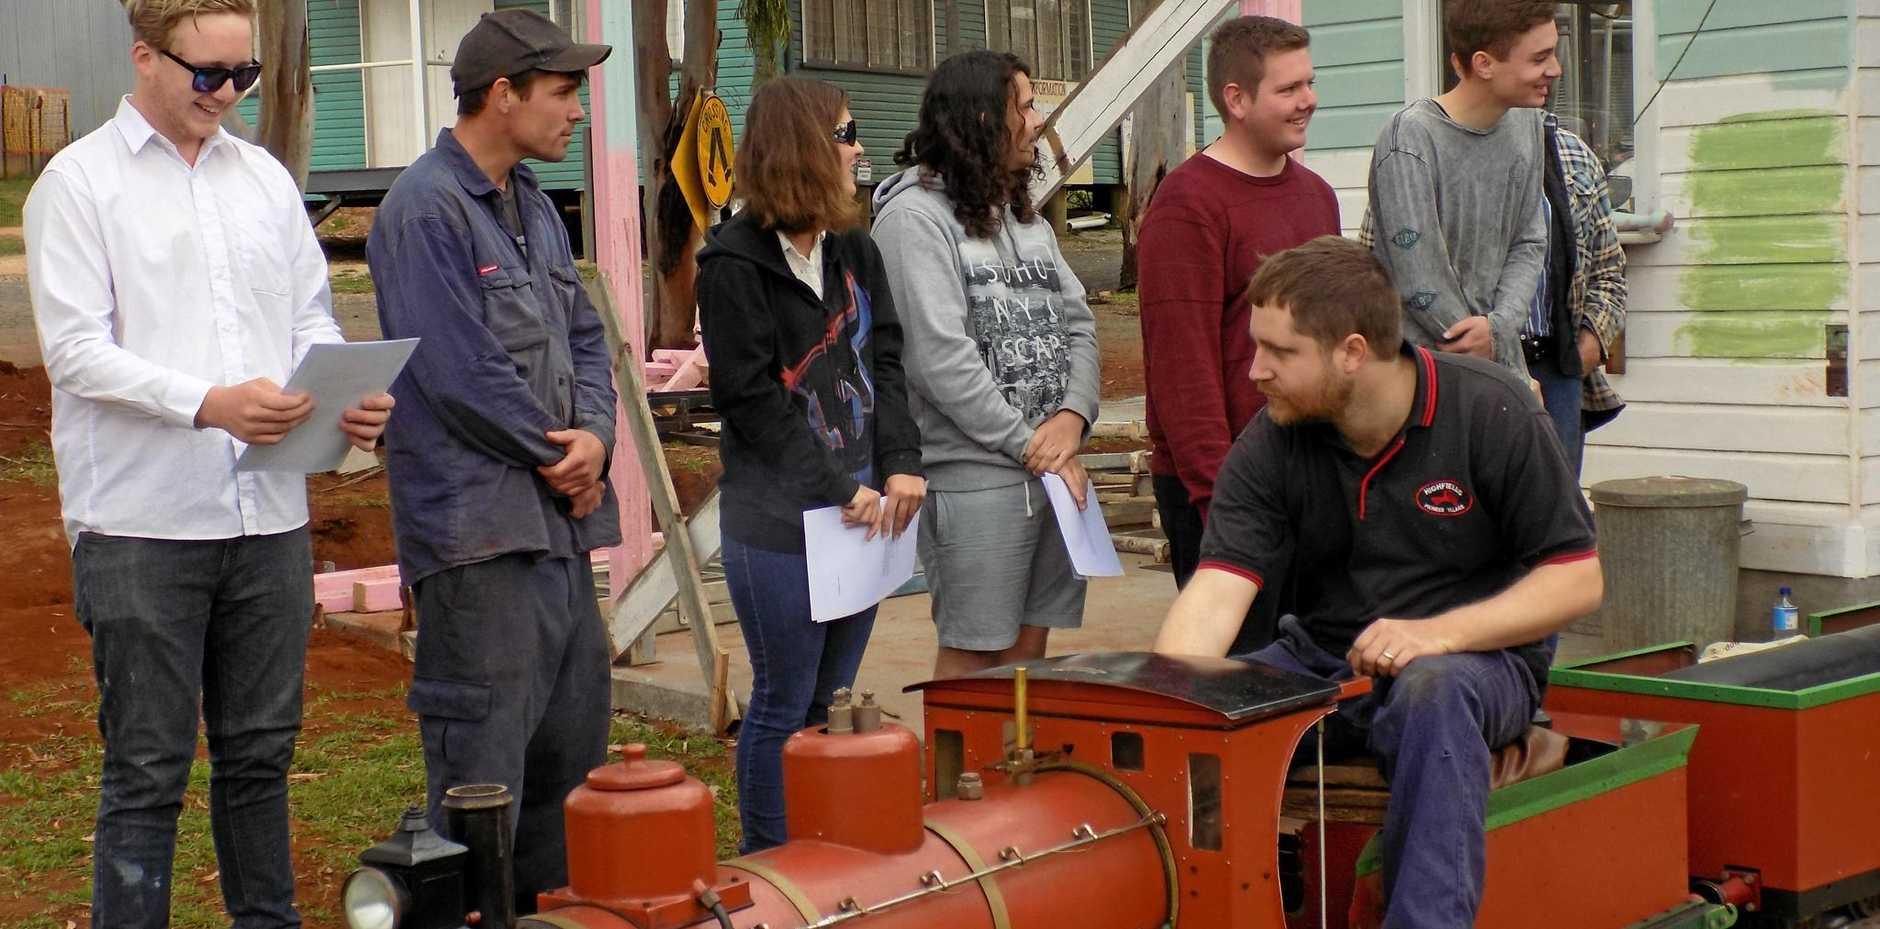 Toowoomba trainees build train tracks with new skills   Chronicle